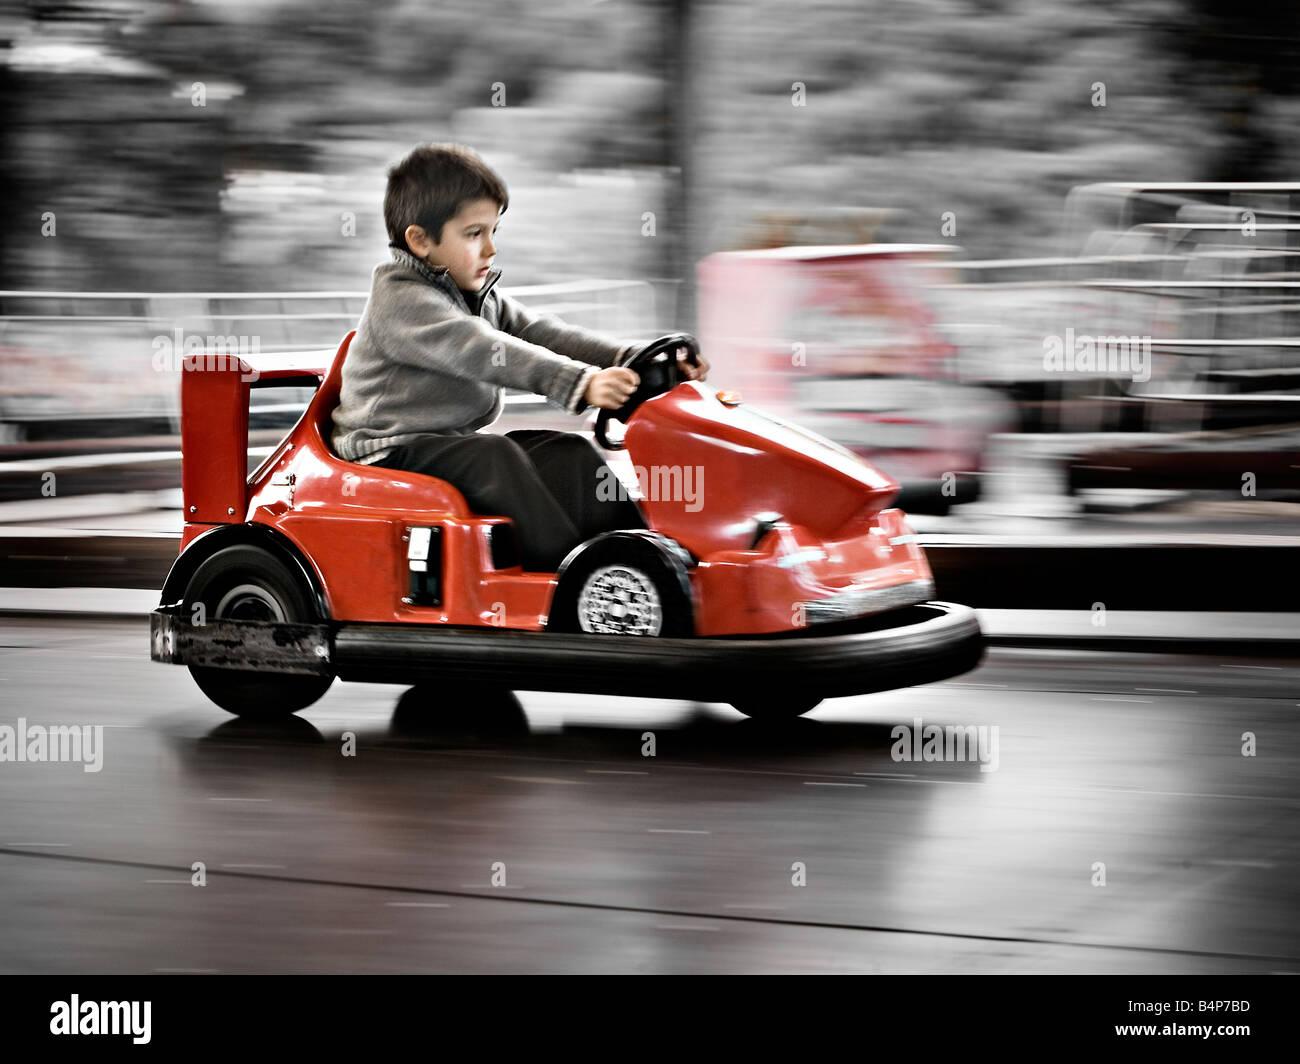 panning - boy in go-kart - Stock Image